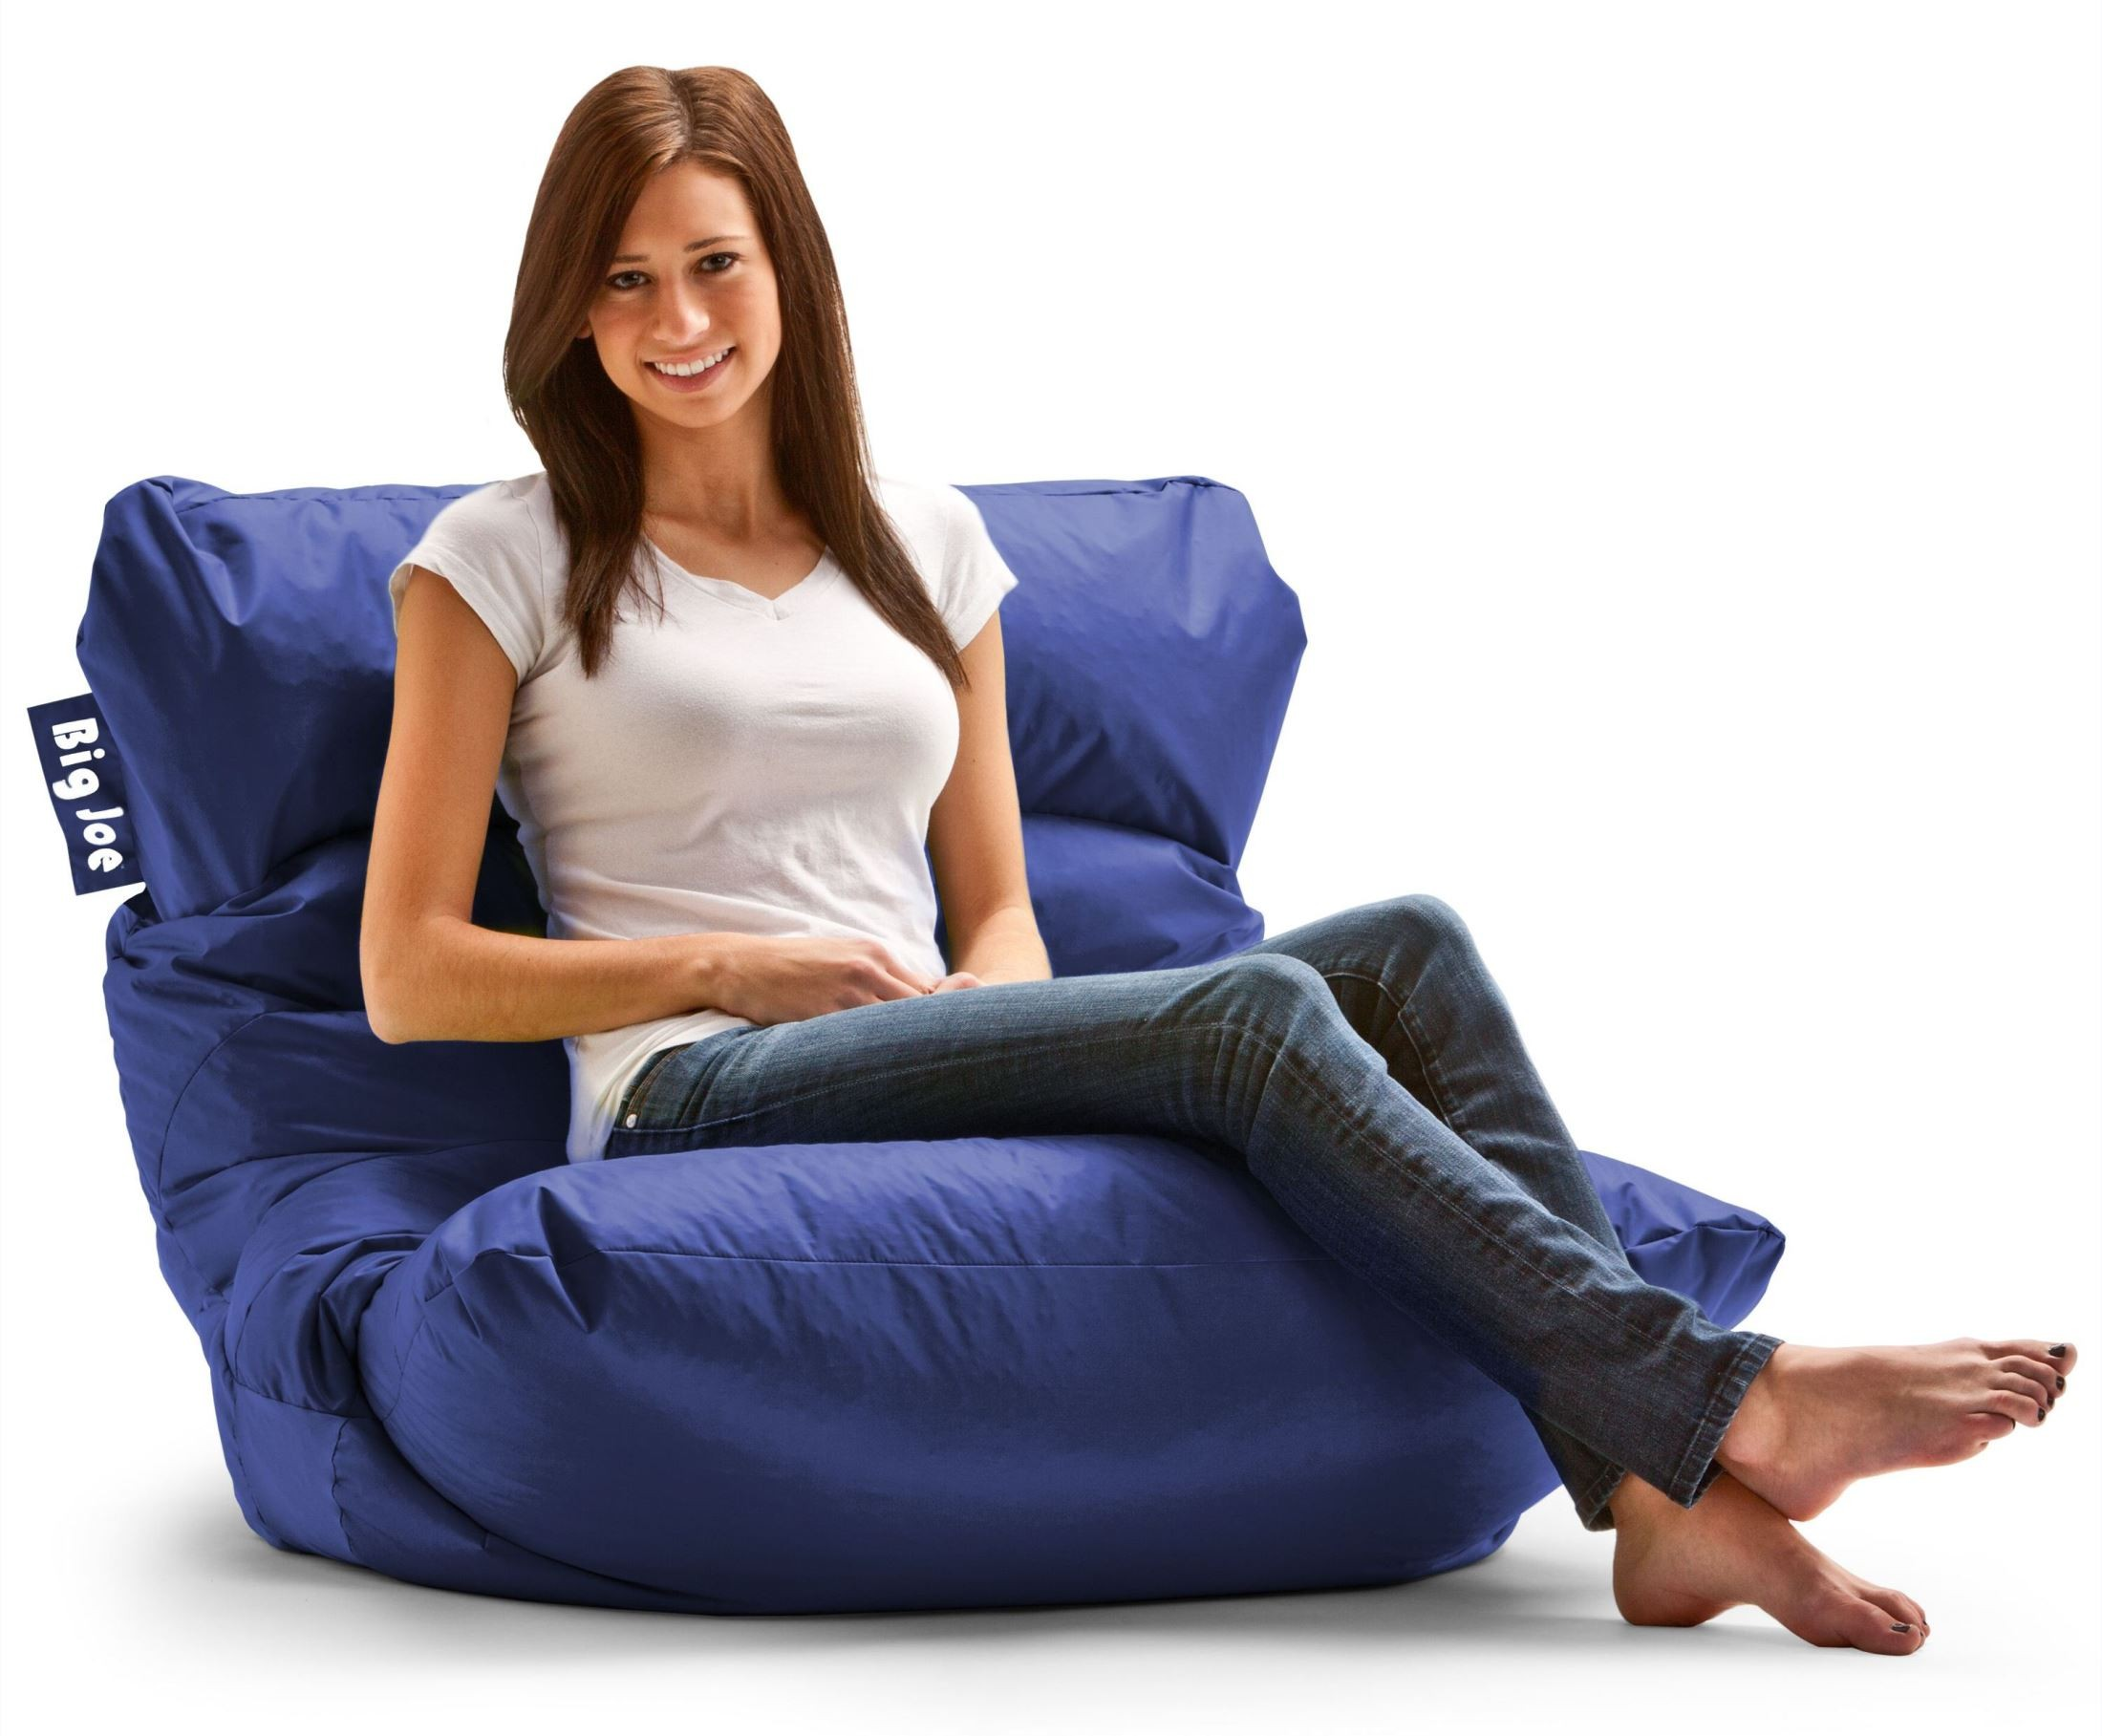 Big joe roma sapphire smartmax bean bag chair from comfort research